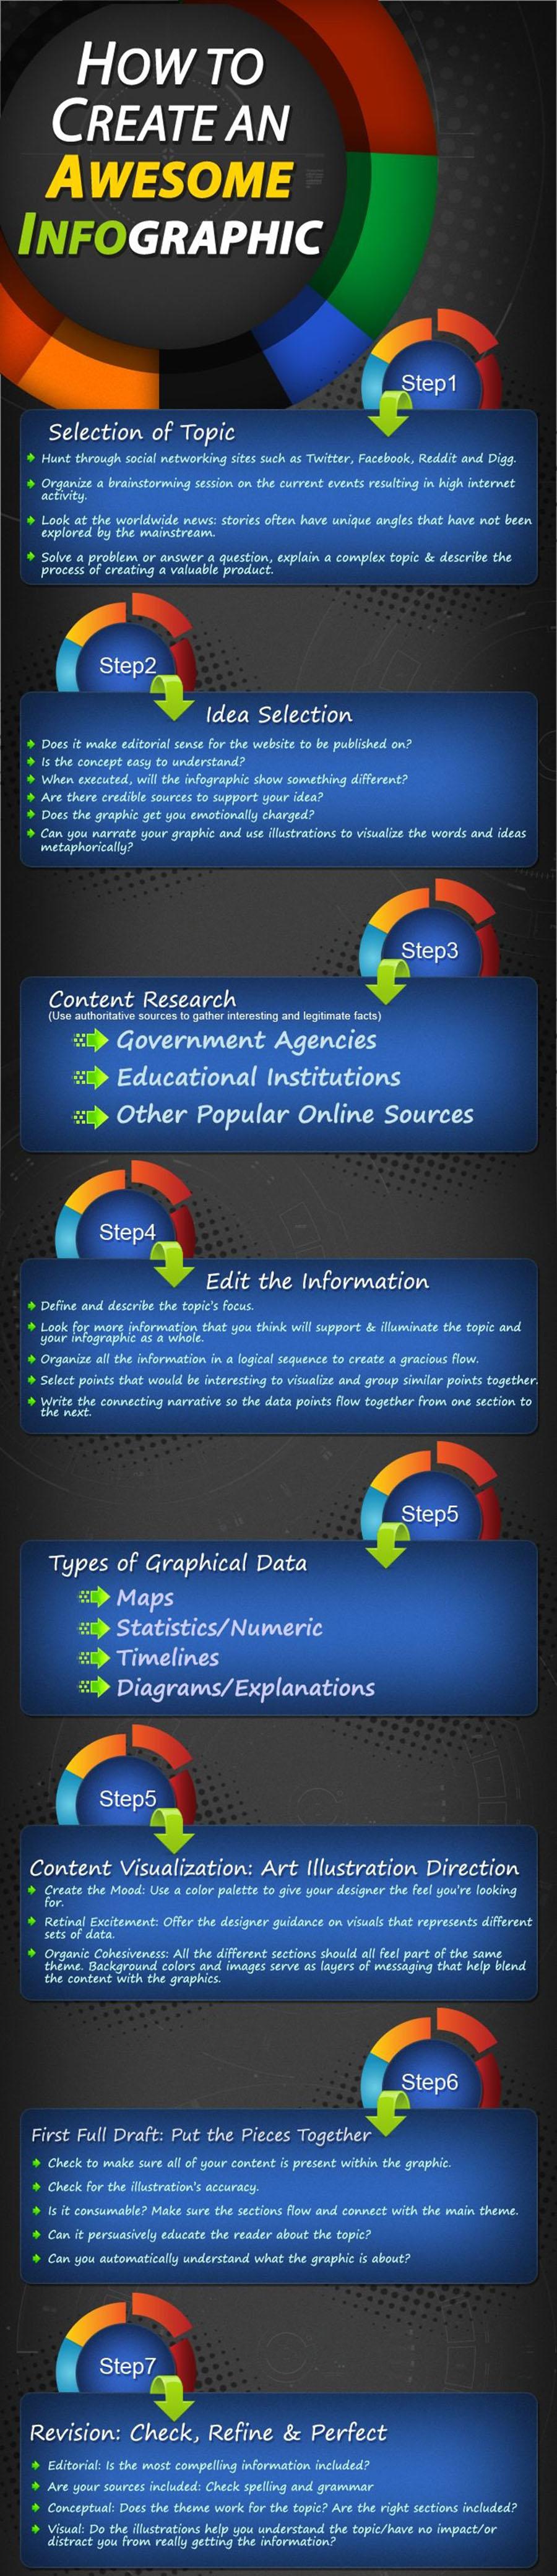 infographic-7.jpg